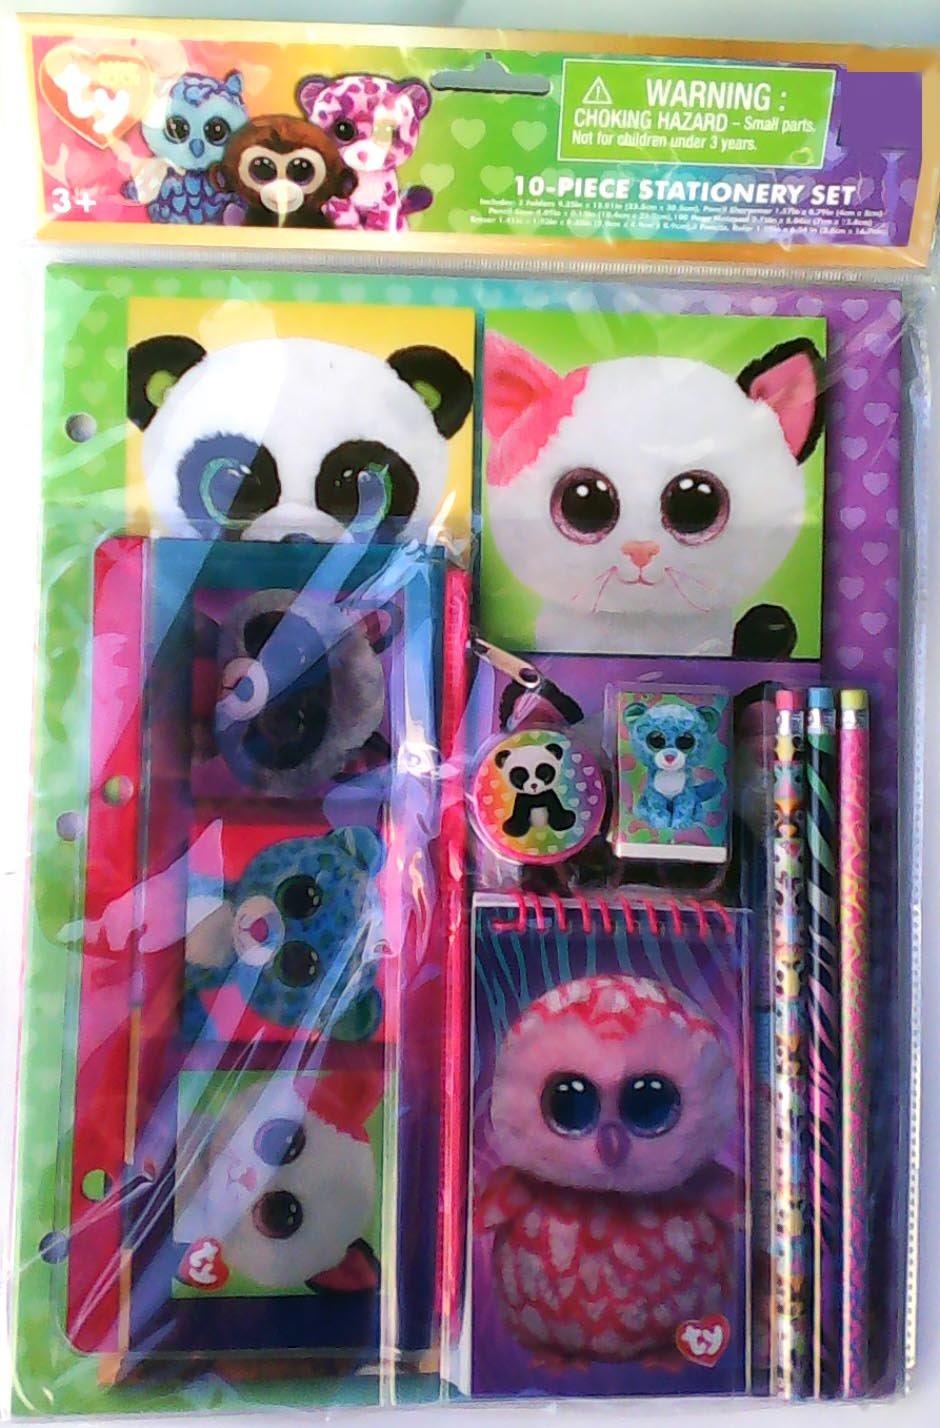 TY Beanie Boos 10 Piece Stationery Set - Folders - Notepad - Pencil Bag - Pencils - Sharpener - Eraser - Ruler Tri-Coastal Design 701817